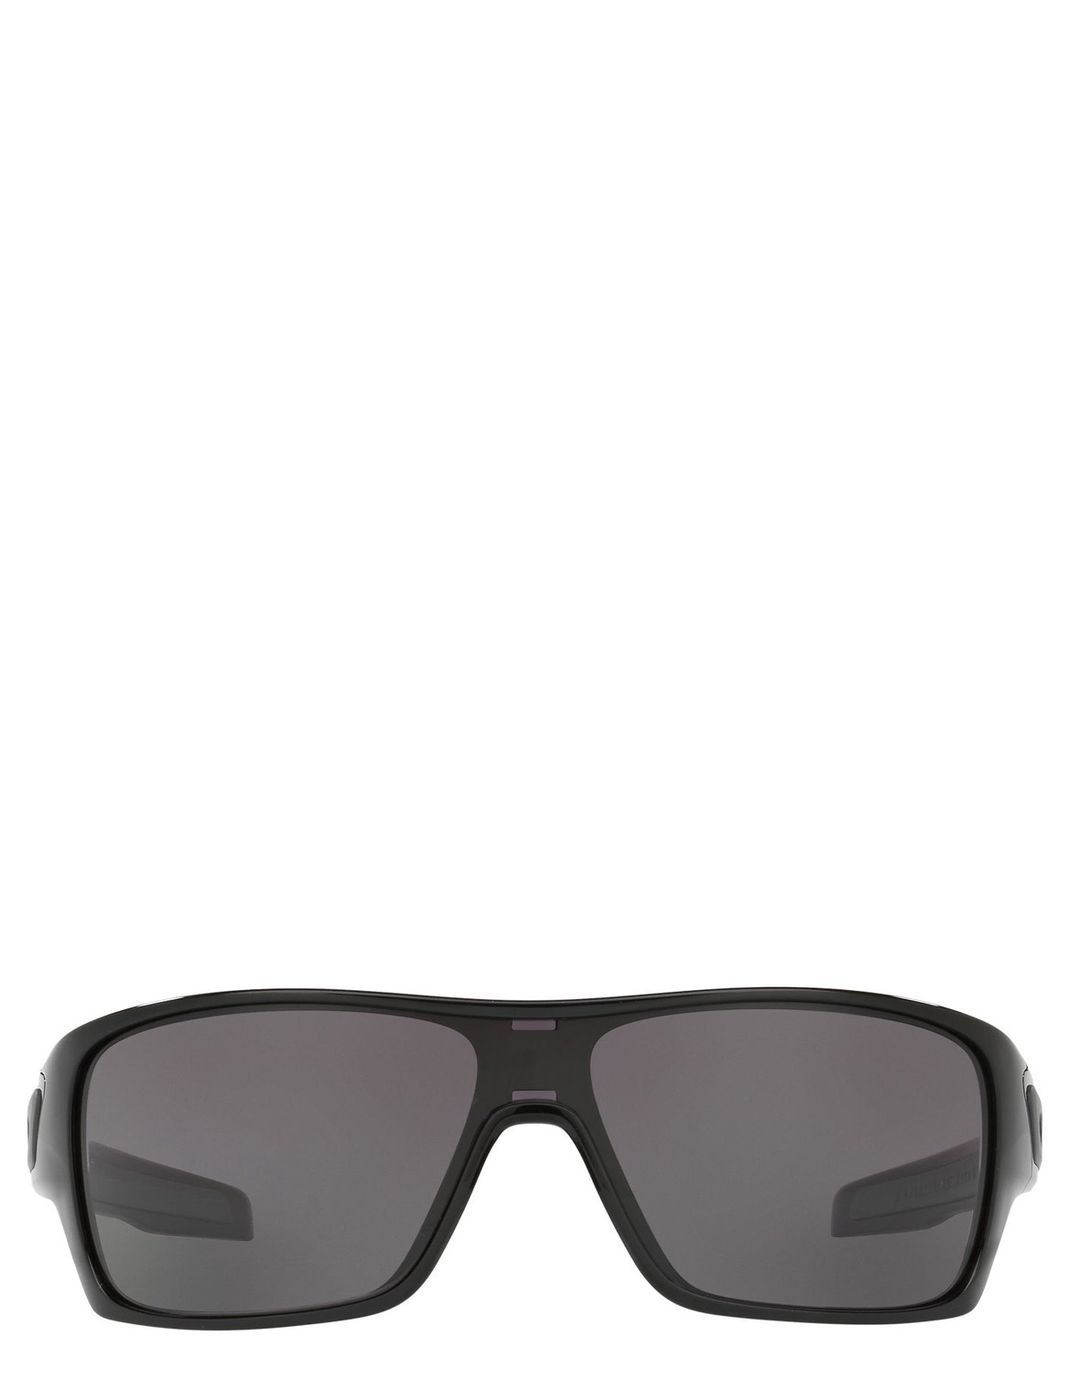 9f1b4a2195 ... spain oakley turbine rotor sunglasses myer online 4d1ab d3860